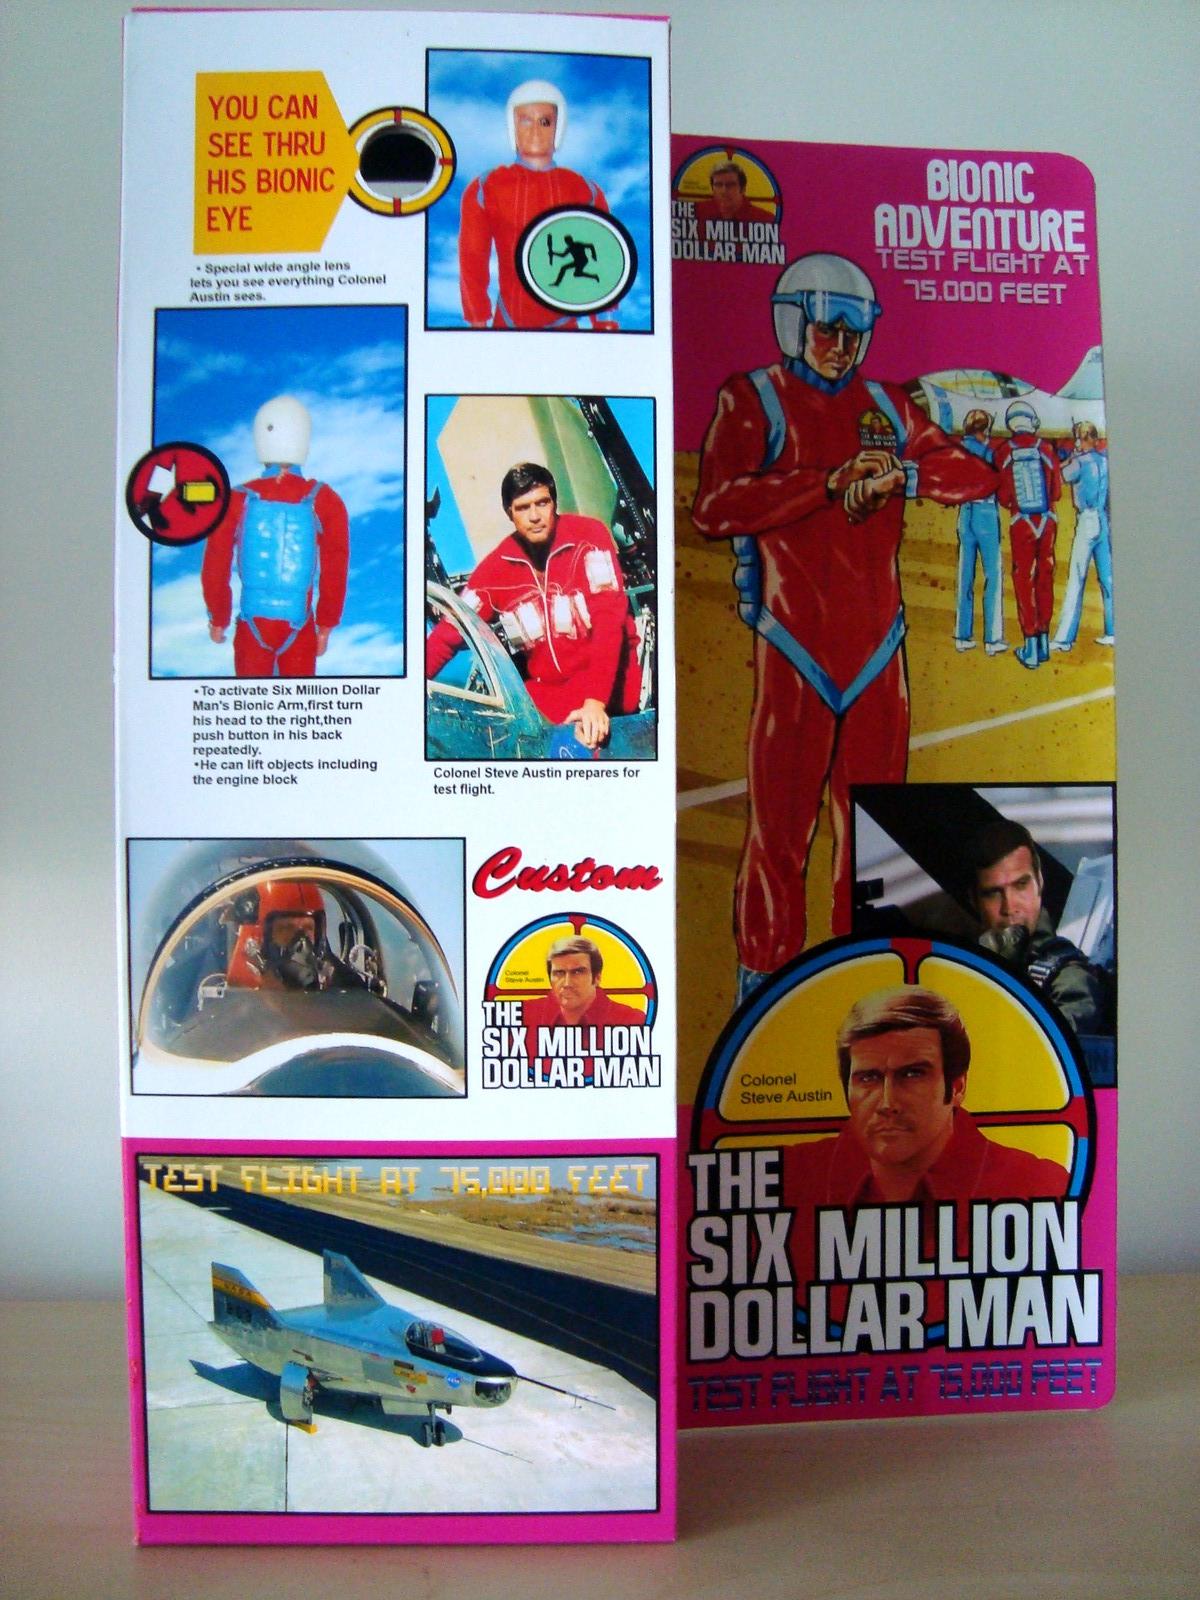 Steve Austin L'homme qui valait 3 milliards - KENNER MECCANO - Page 11 170707071737408004